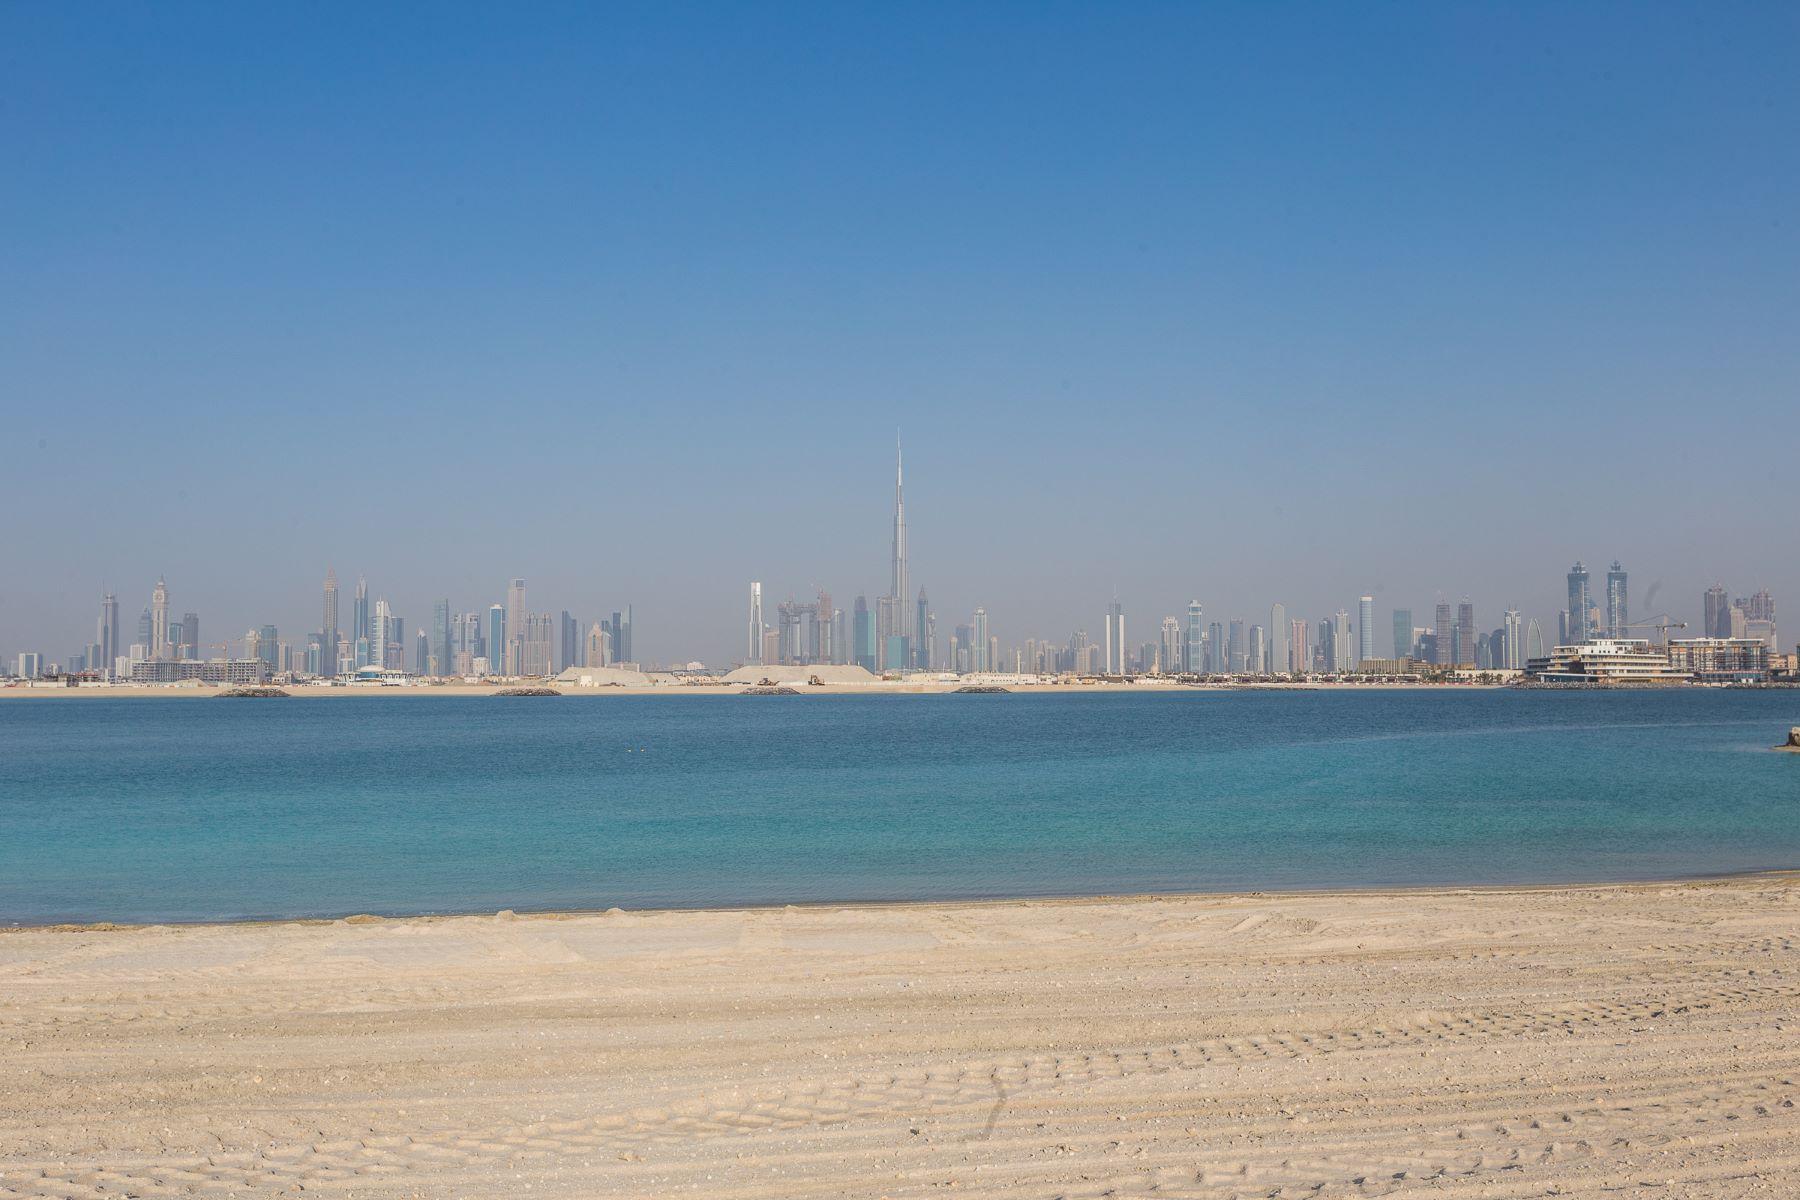 Land for Sale at Special Offer 1000PSF 3 YR PP Biggest plot Jumeirah Bay Island Jumeirah Dubai, Dubai 0 United Arab Emirates